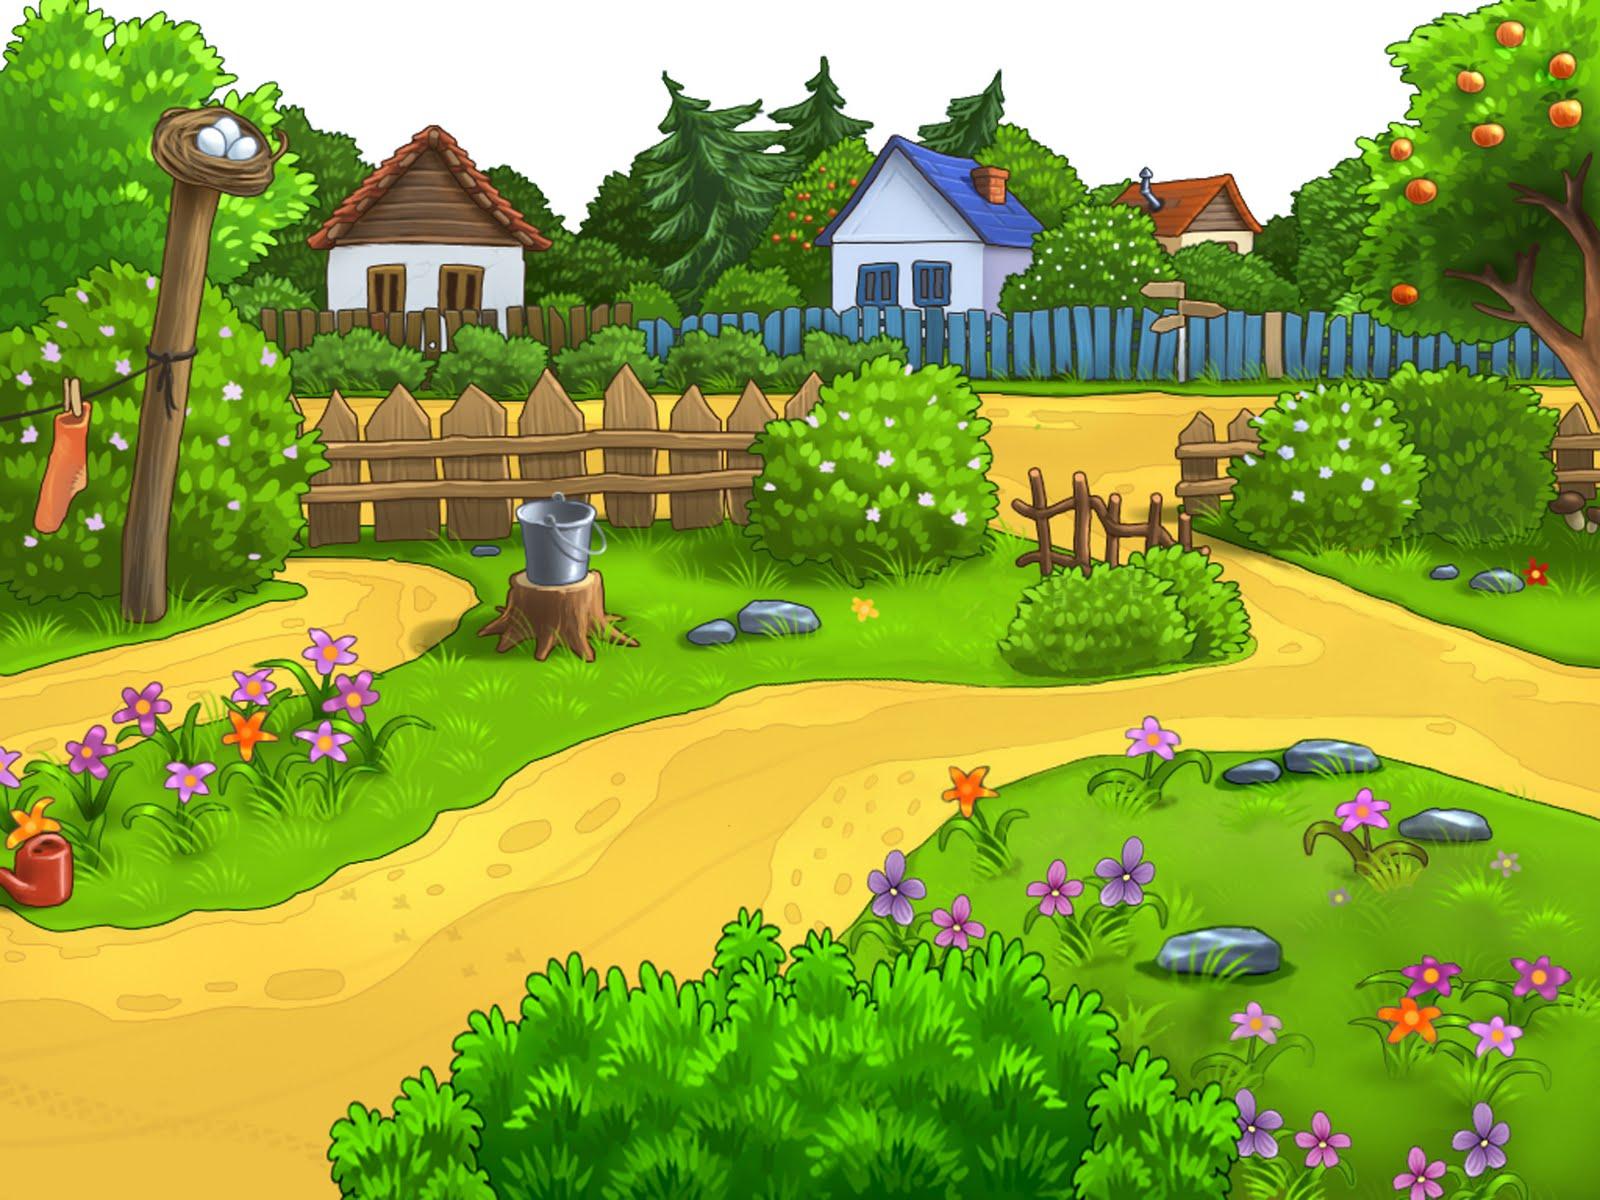 Fonditos de paisajes psd infantiles imagui for Jardin dibujo